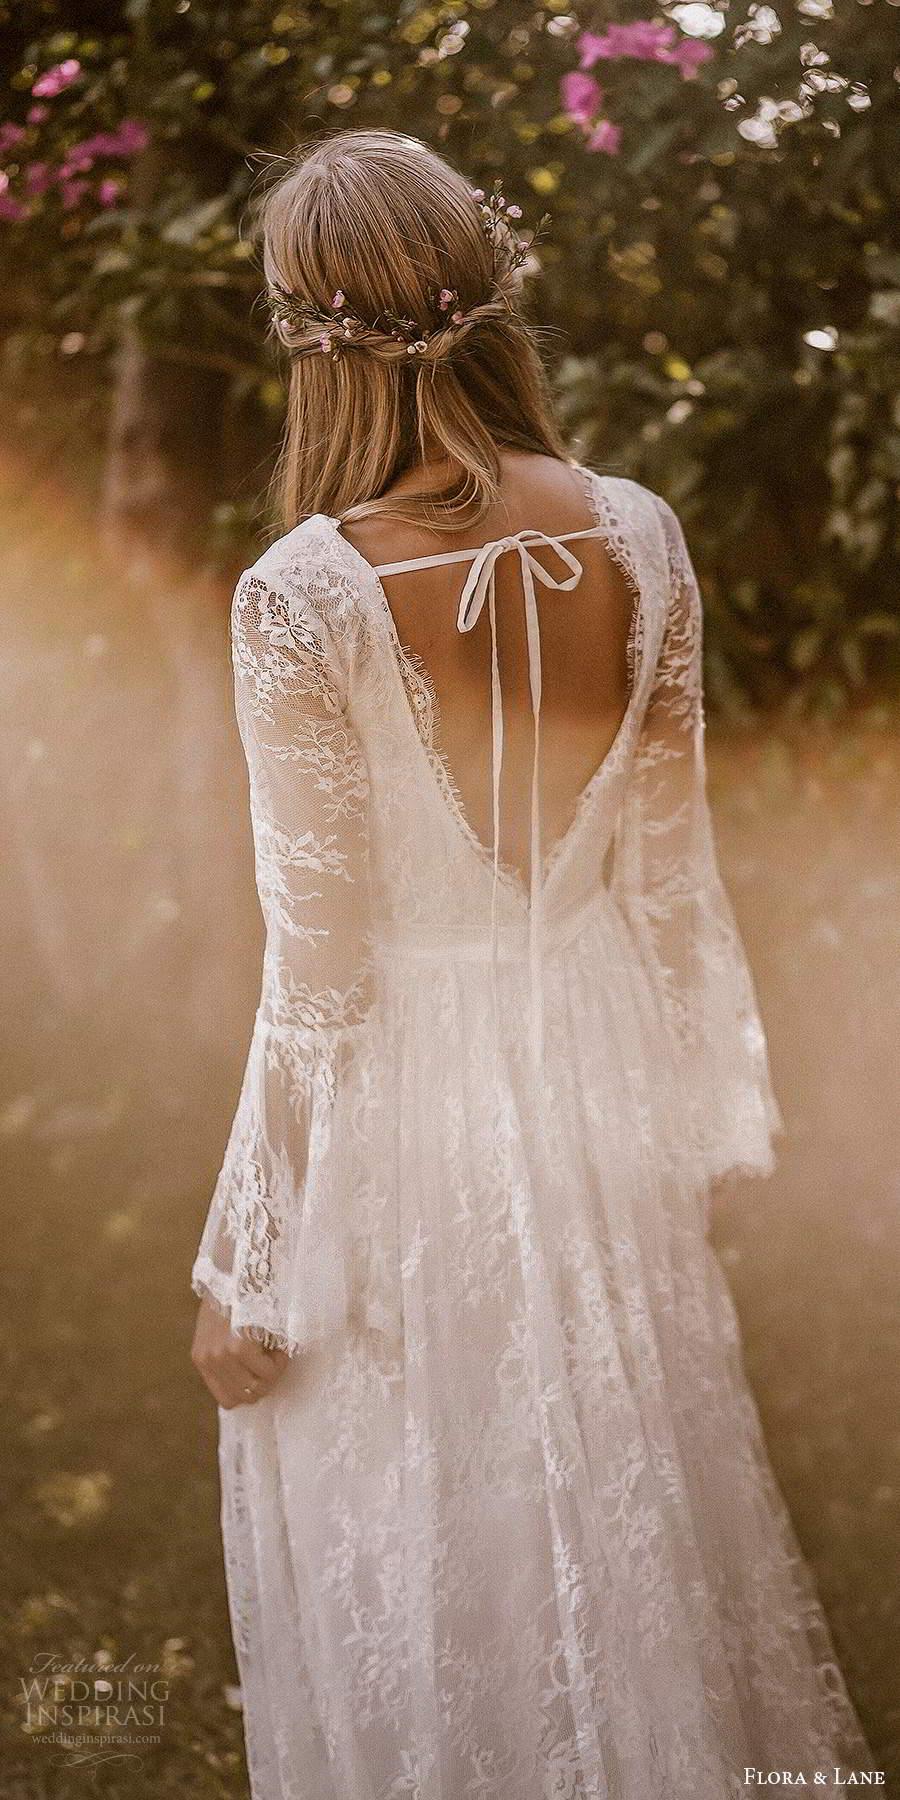 flora and lane 2019 bridal long flare sleeves v neckline fully embellished lace boho romantic a line wedding dress v back chapel train (3) zbv